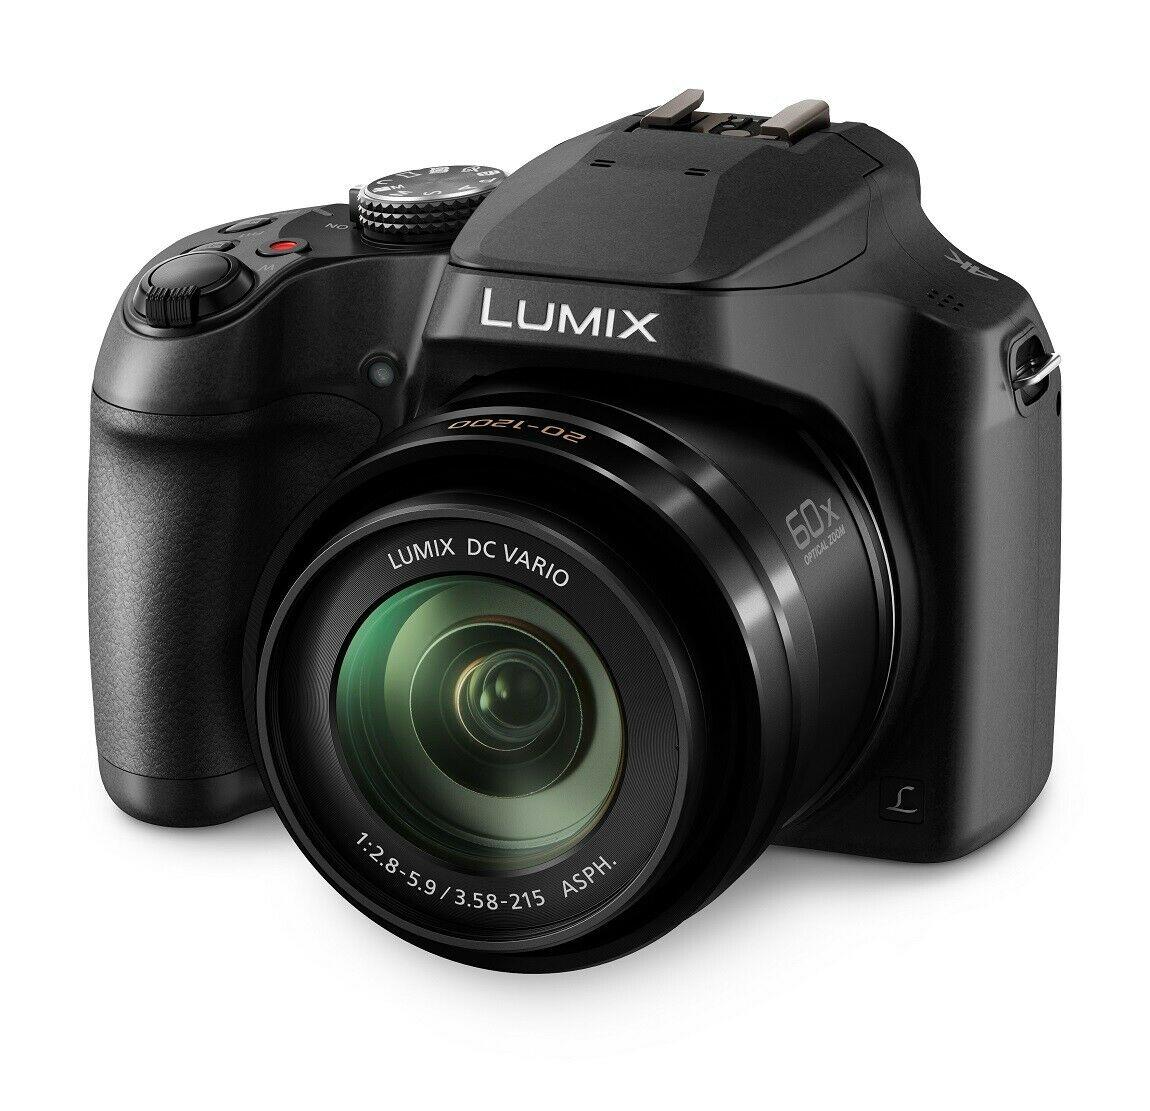 New Panasonic DC-FZ82EB-K Lumix Digital Bridge Camera 18.1MP 60x Zoom, brand new - £224.99 delivered with code @ Panasonic / eBay